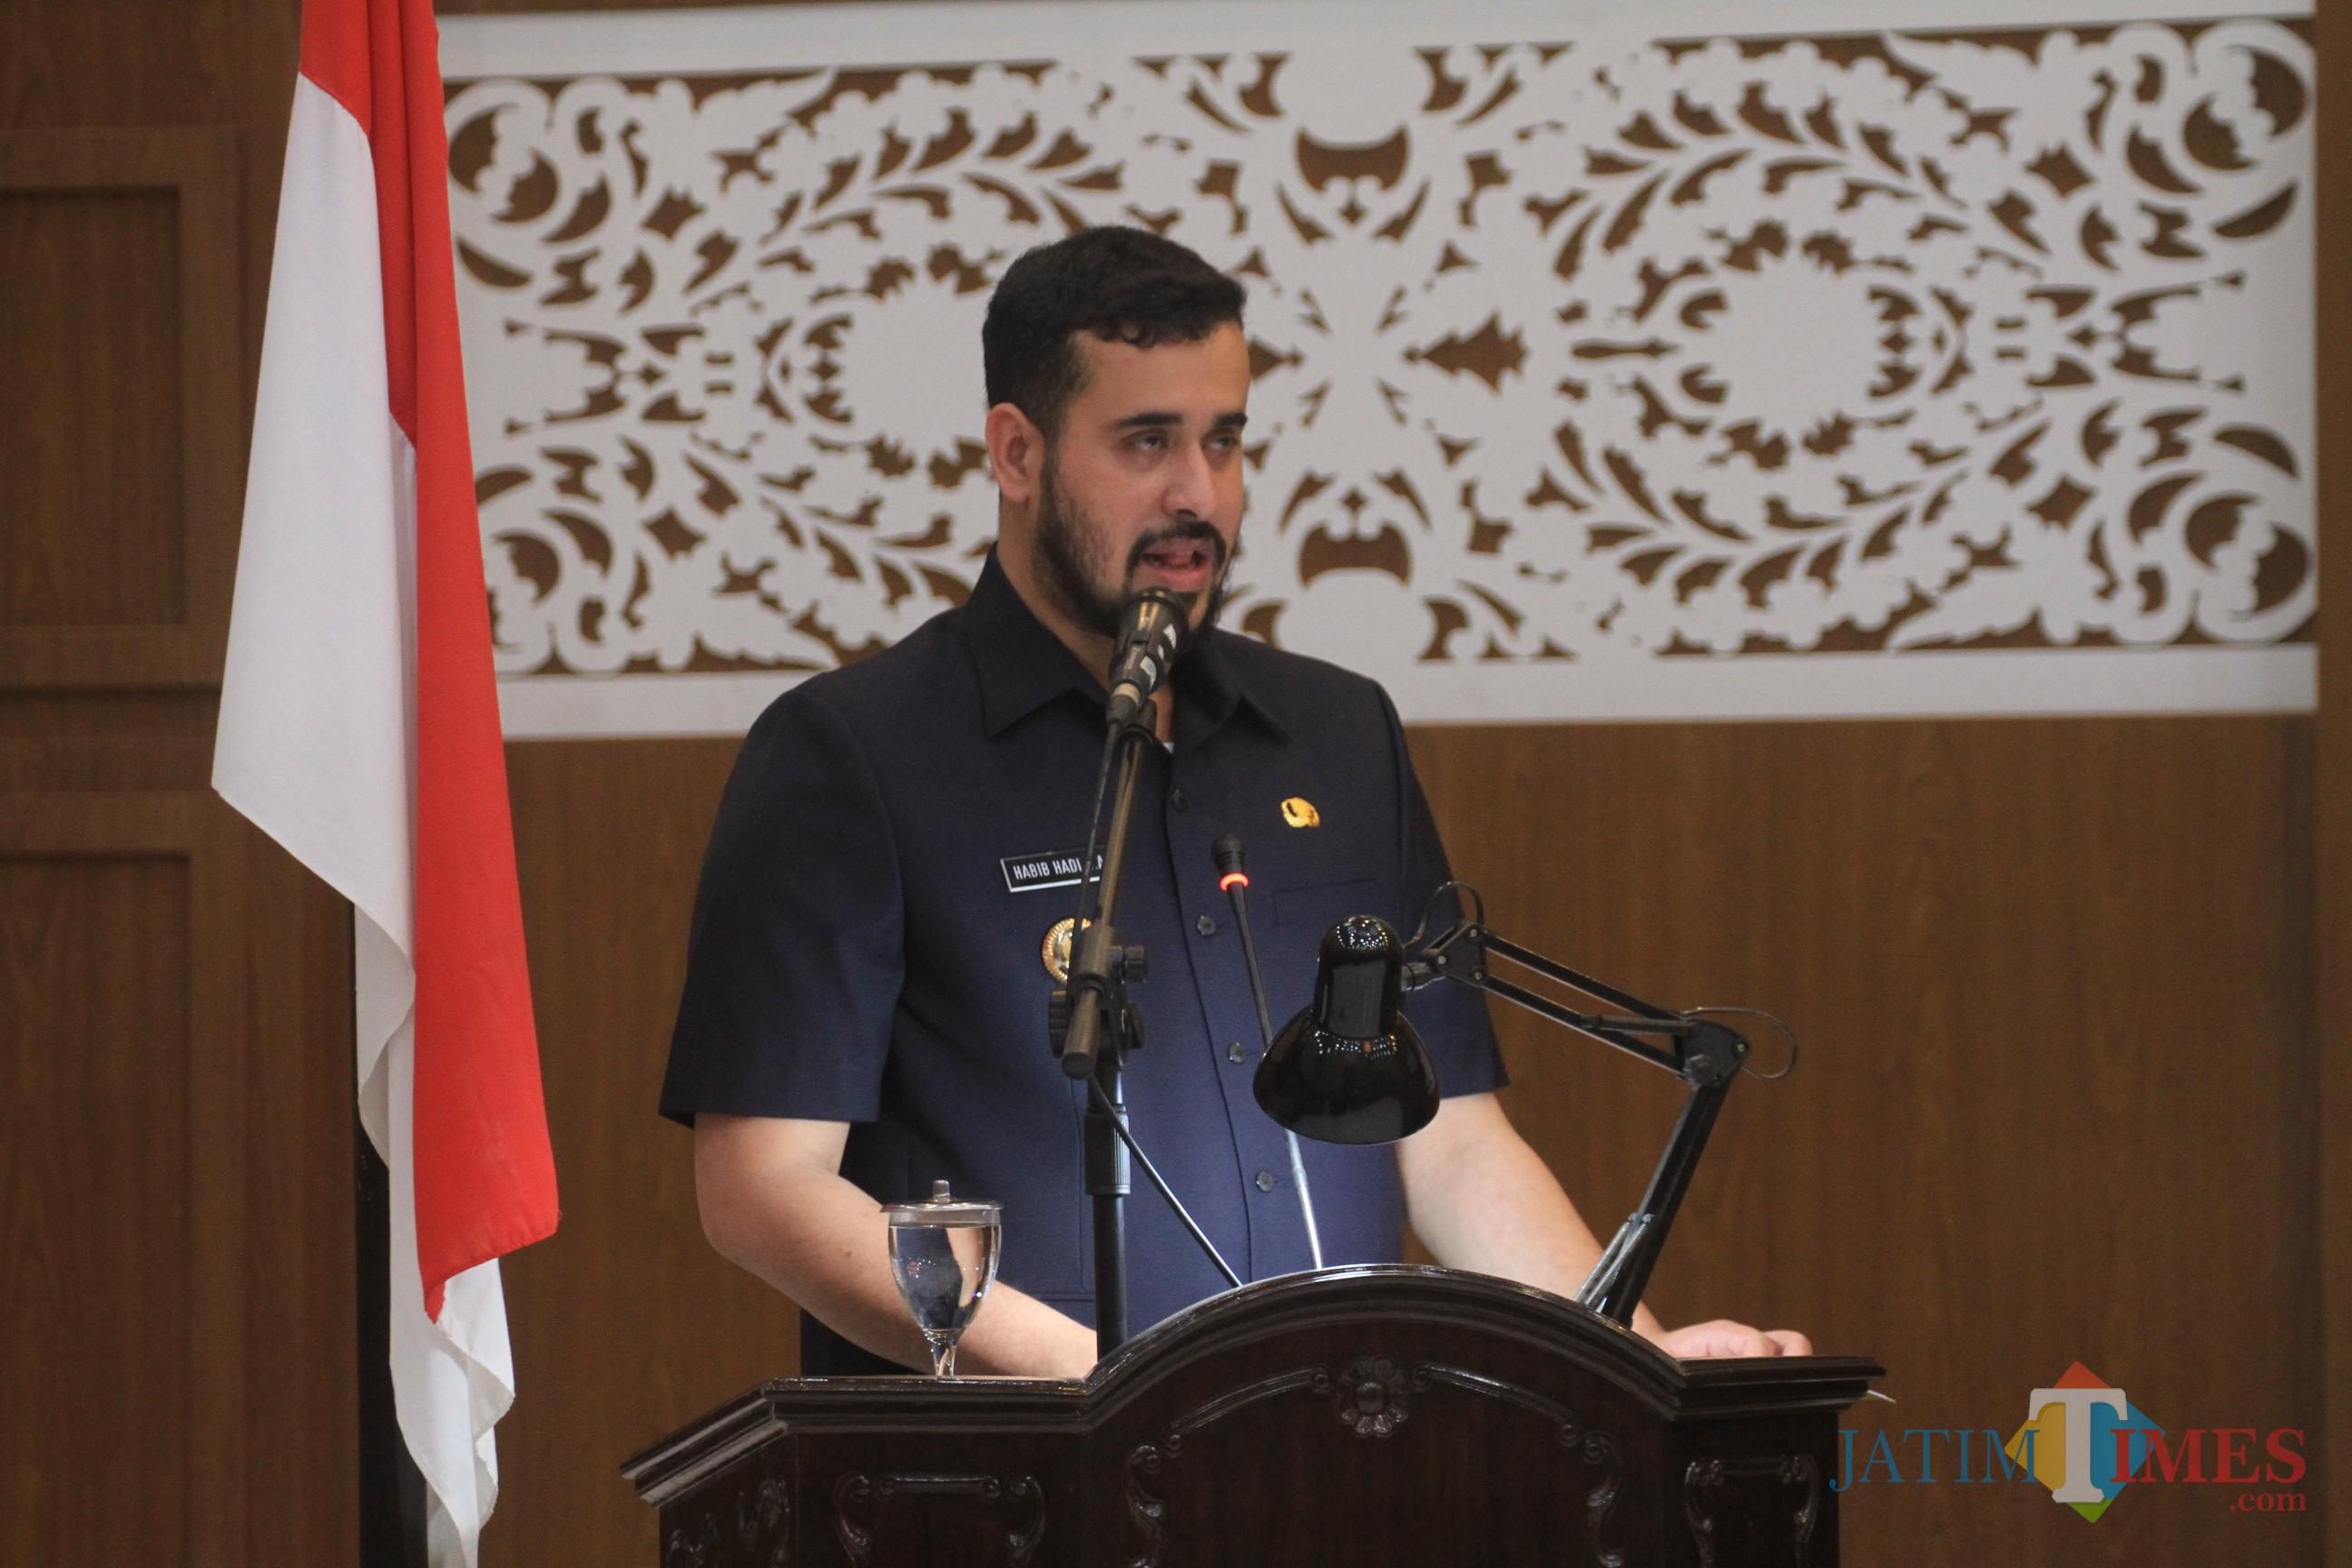 Wali kota Hadi Zainal Abidin saat membacakan nota penjelasan 2 Raberda pada rapat paripurna di Gedung DPRD Kamis kemarin malam (Agus Salam/Jatim TIMES)